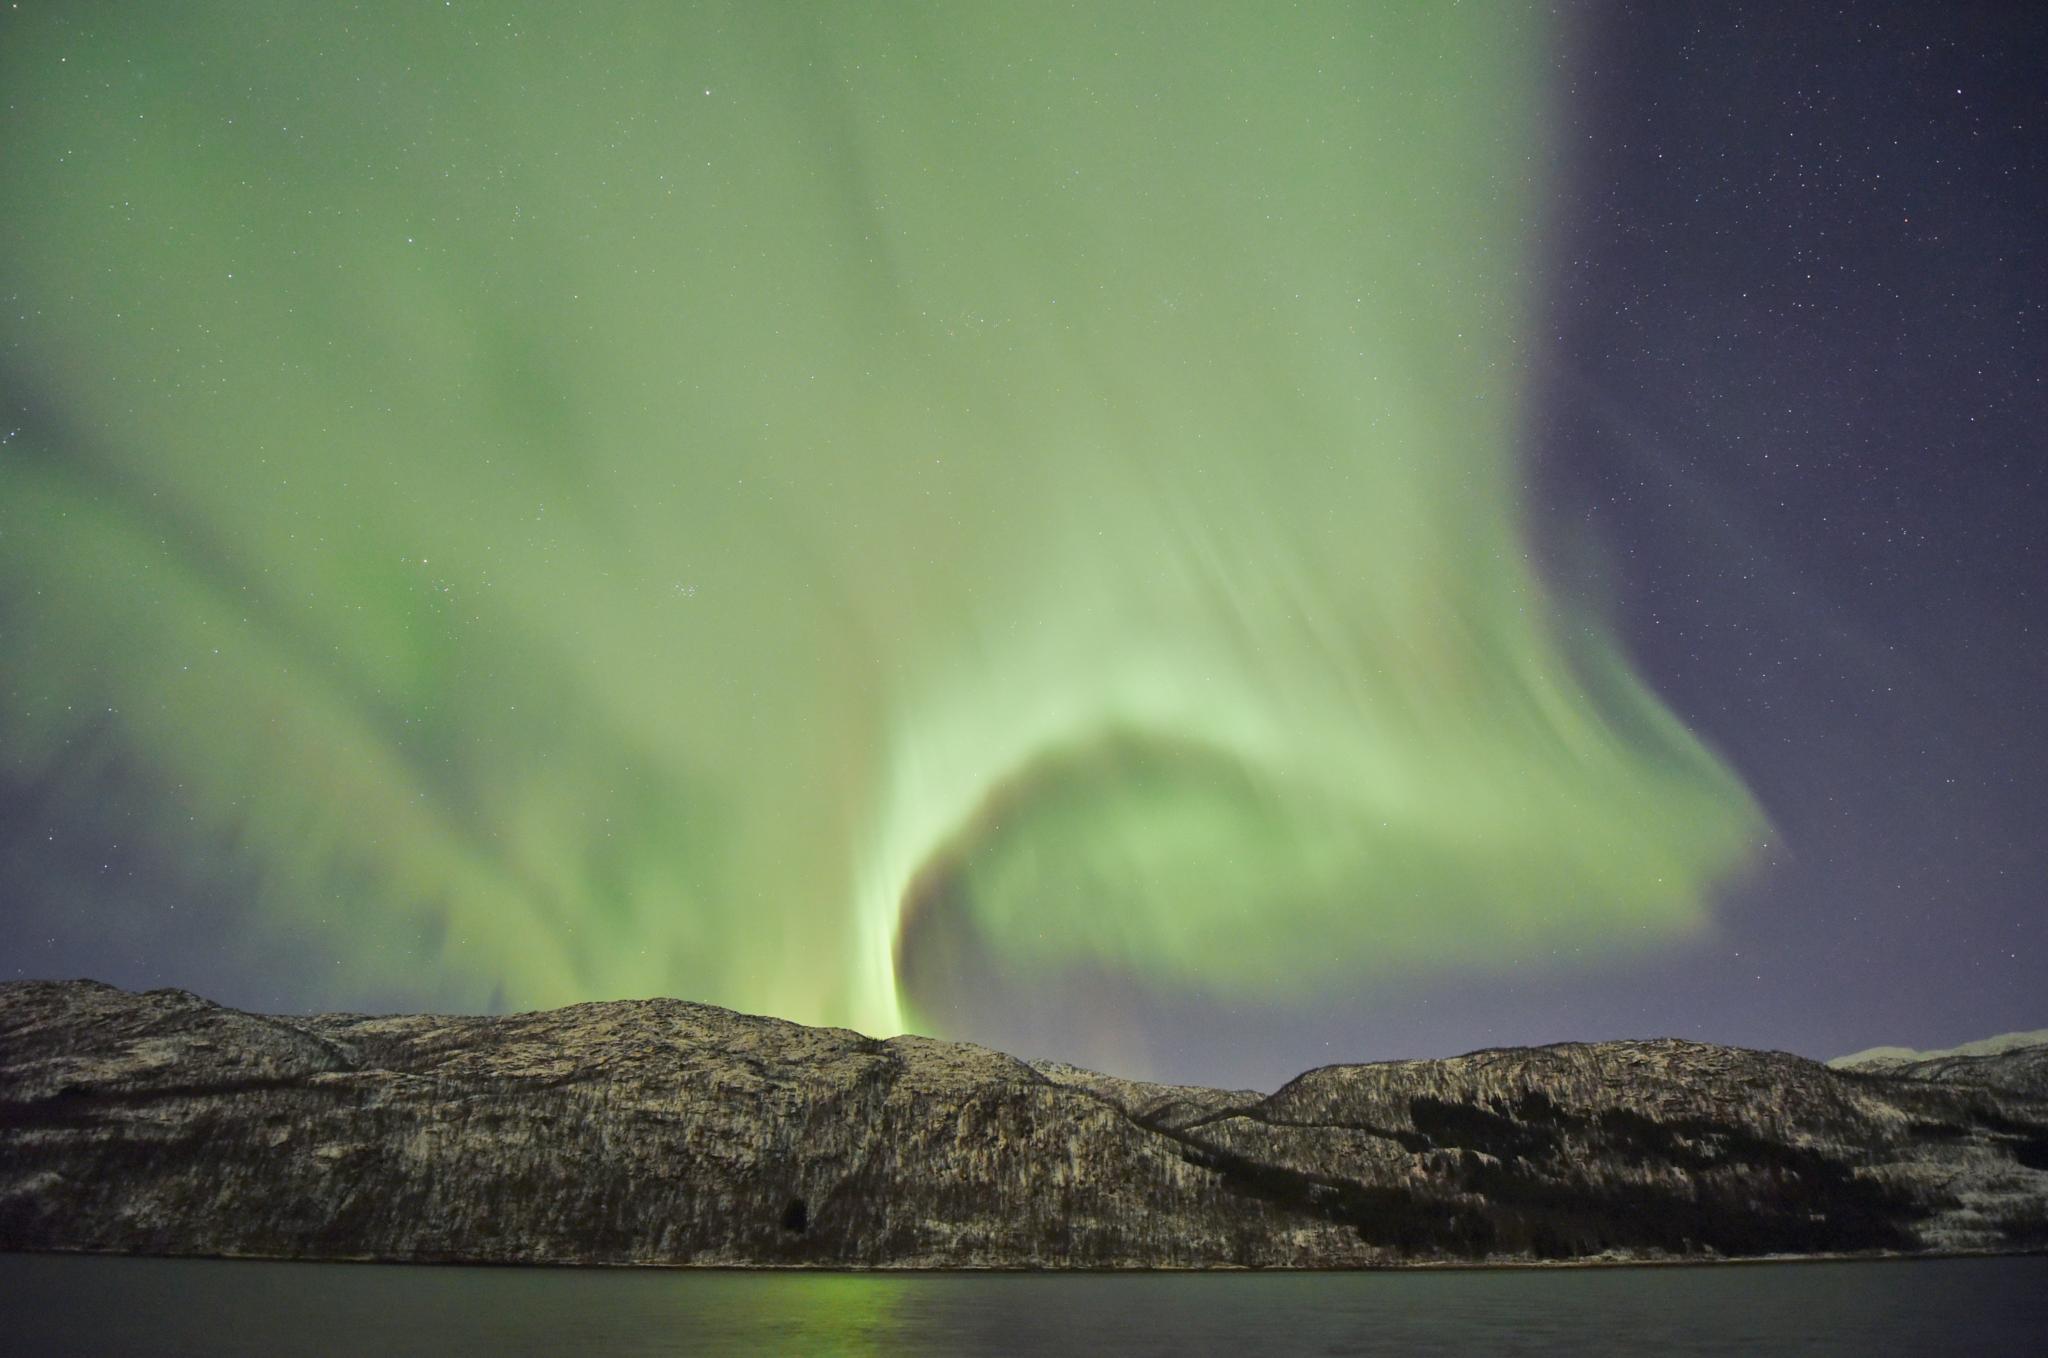 Green curl above the hill by E Pedersen